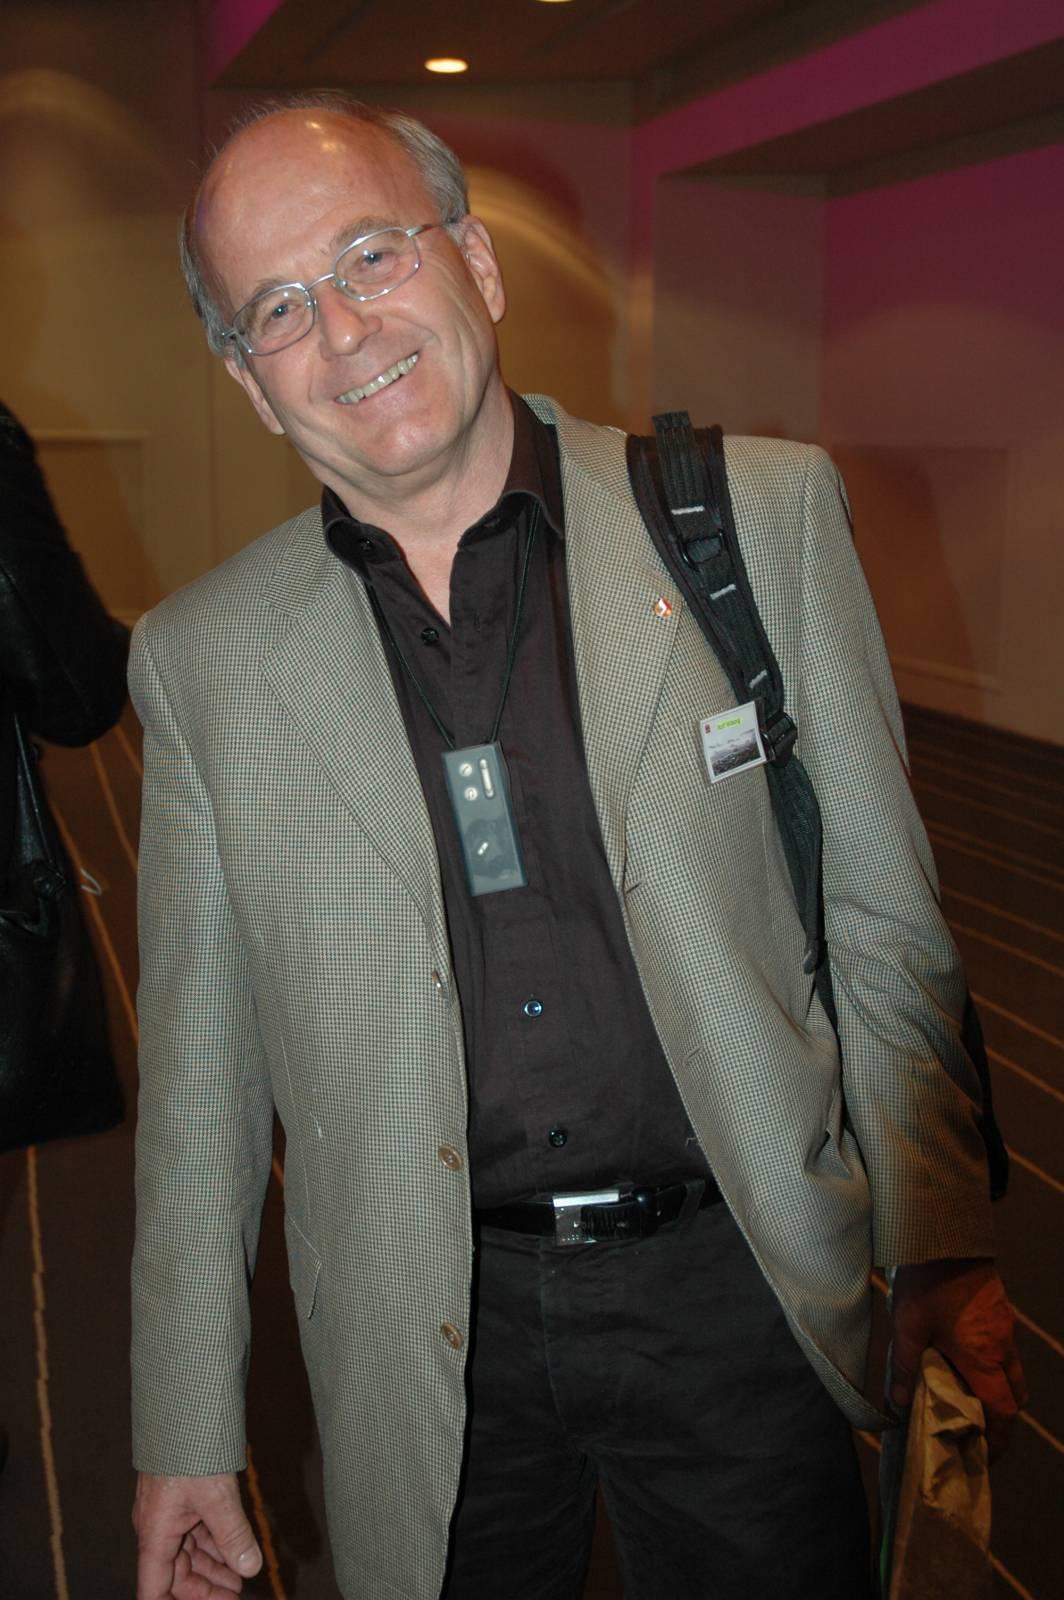 Rolf Wiborg